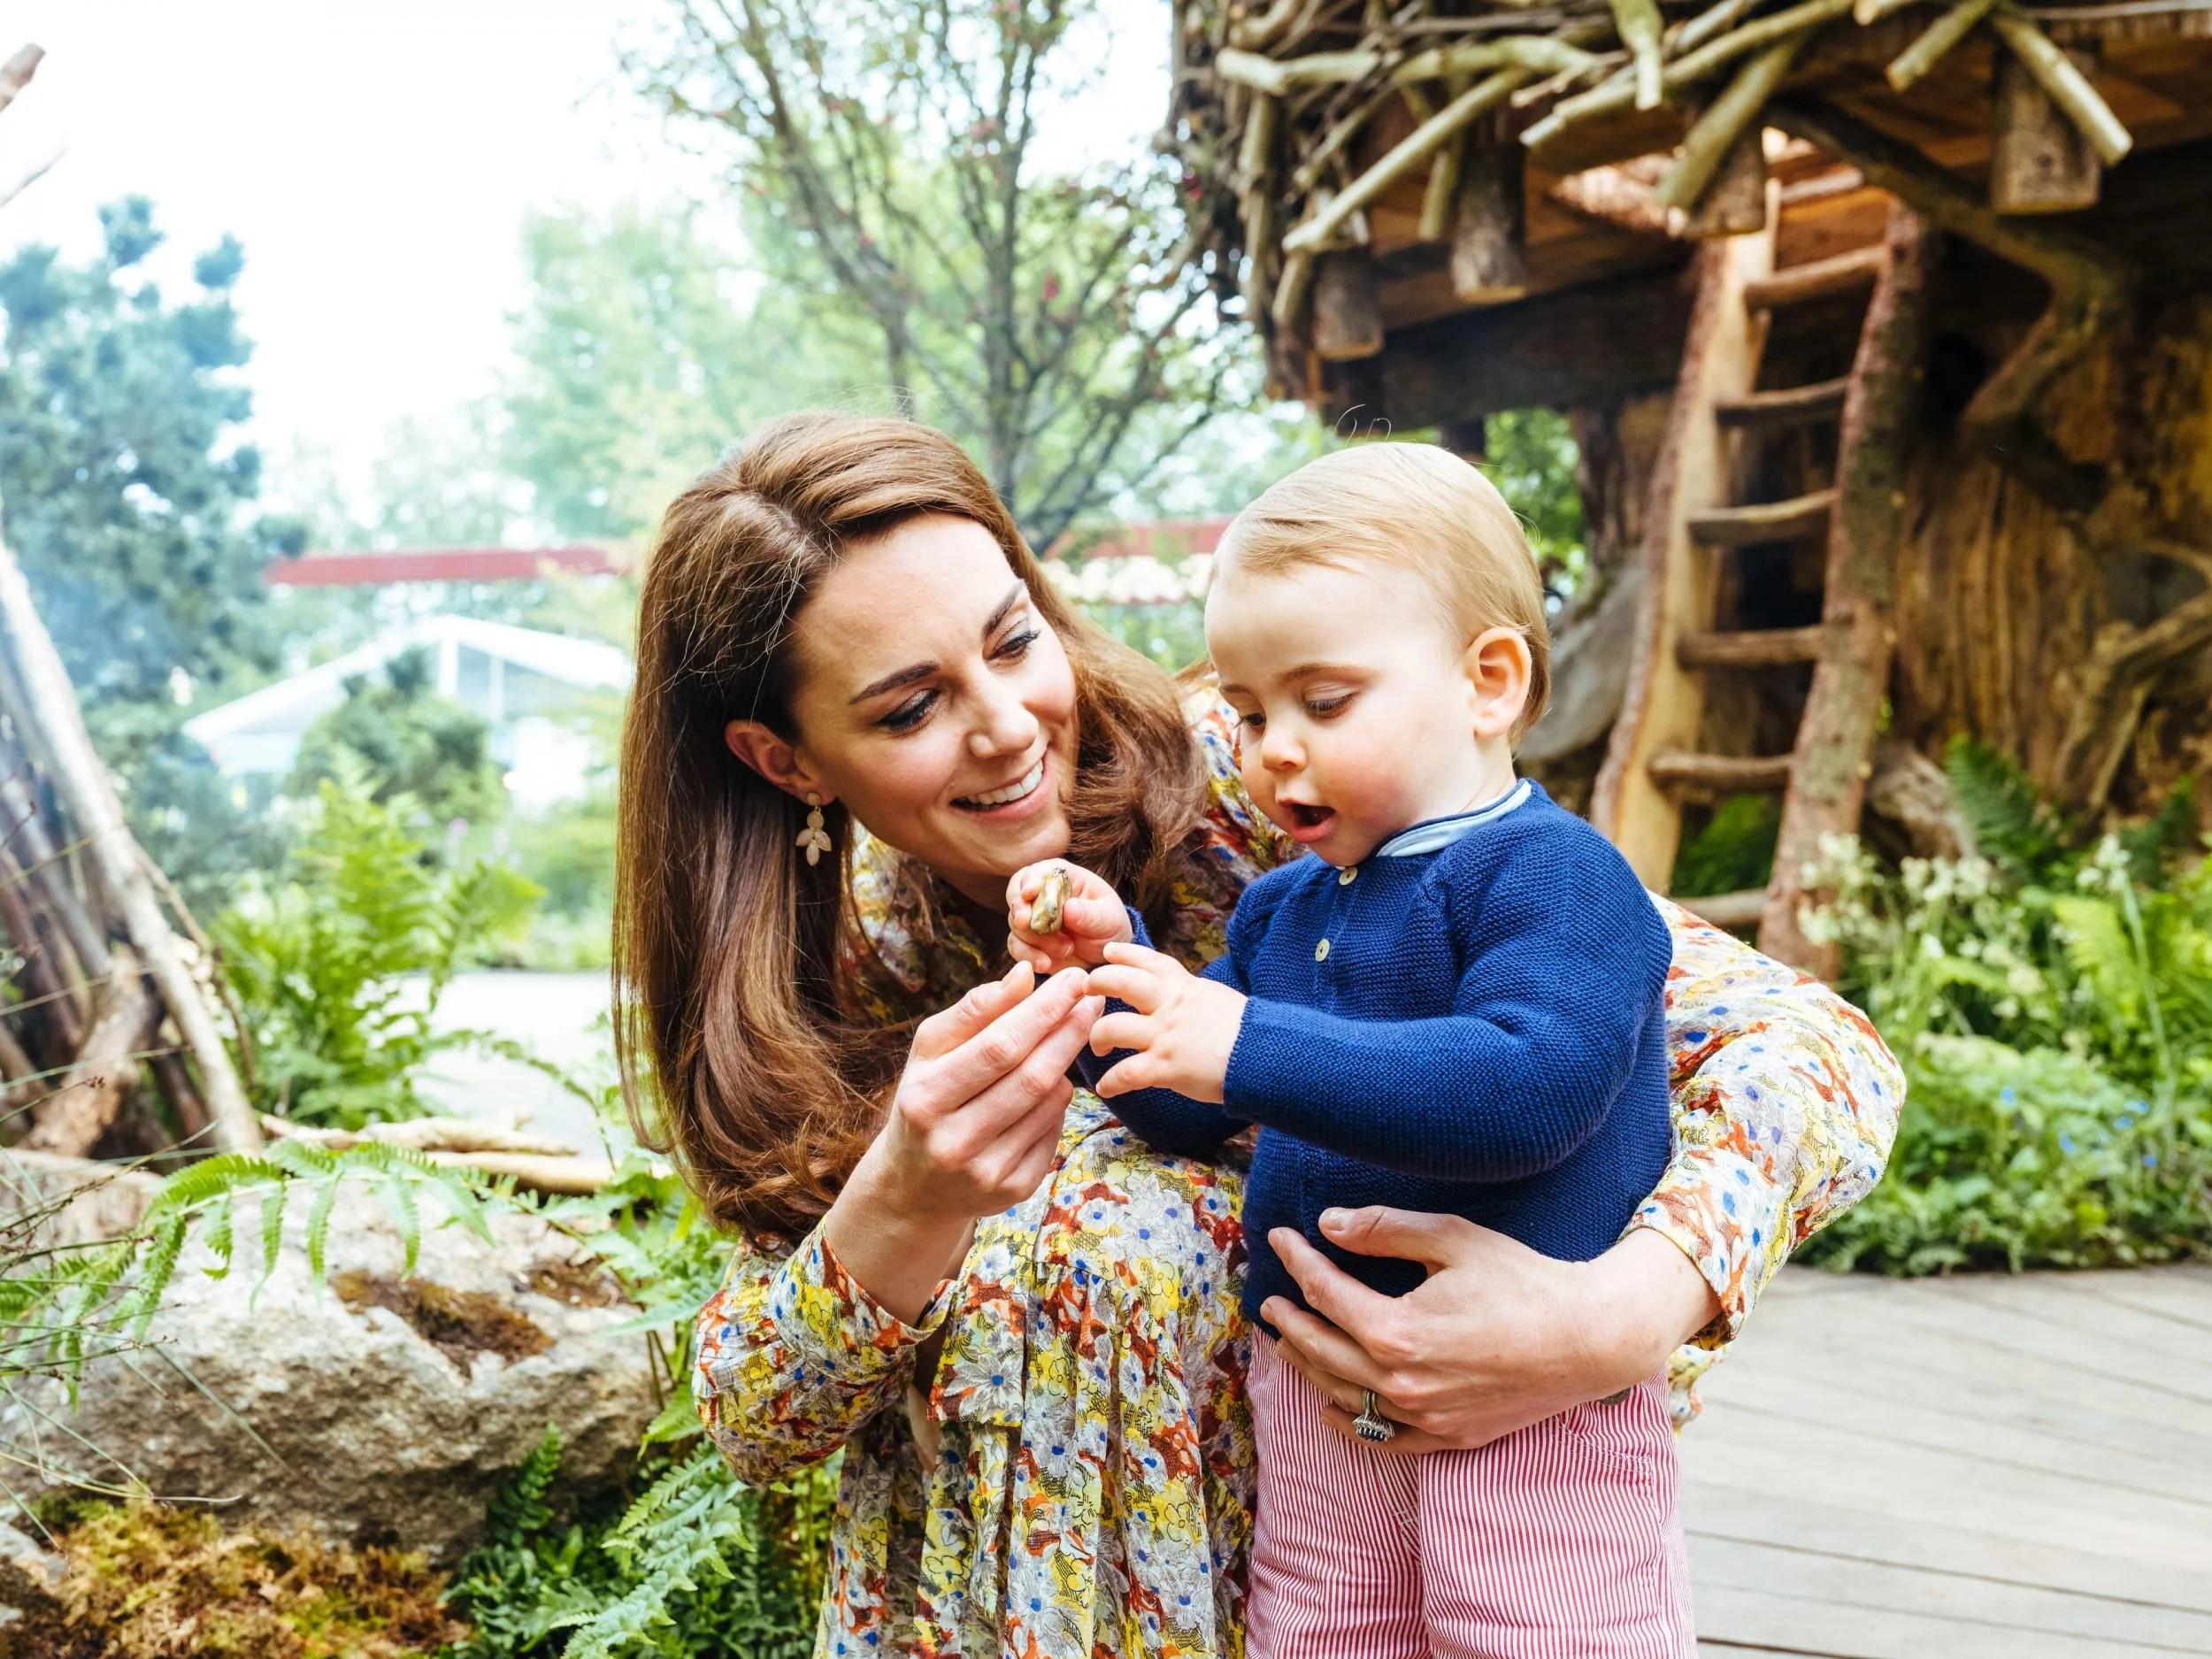 sei68391971 Adorable photos of Royal Family in Kate Middleton's Chelsea Flower Show garden released